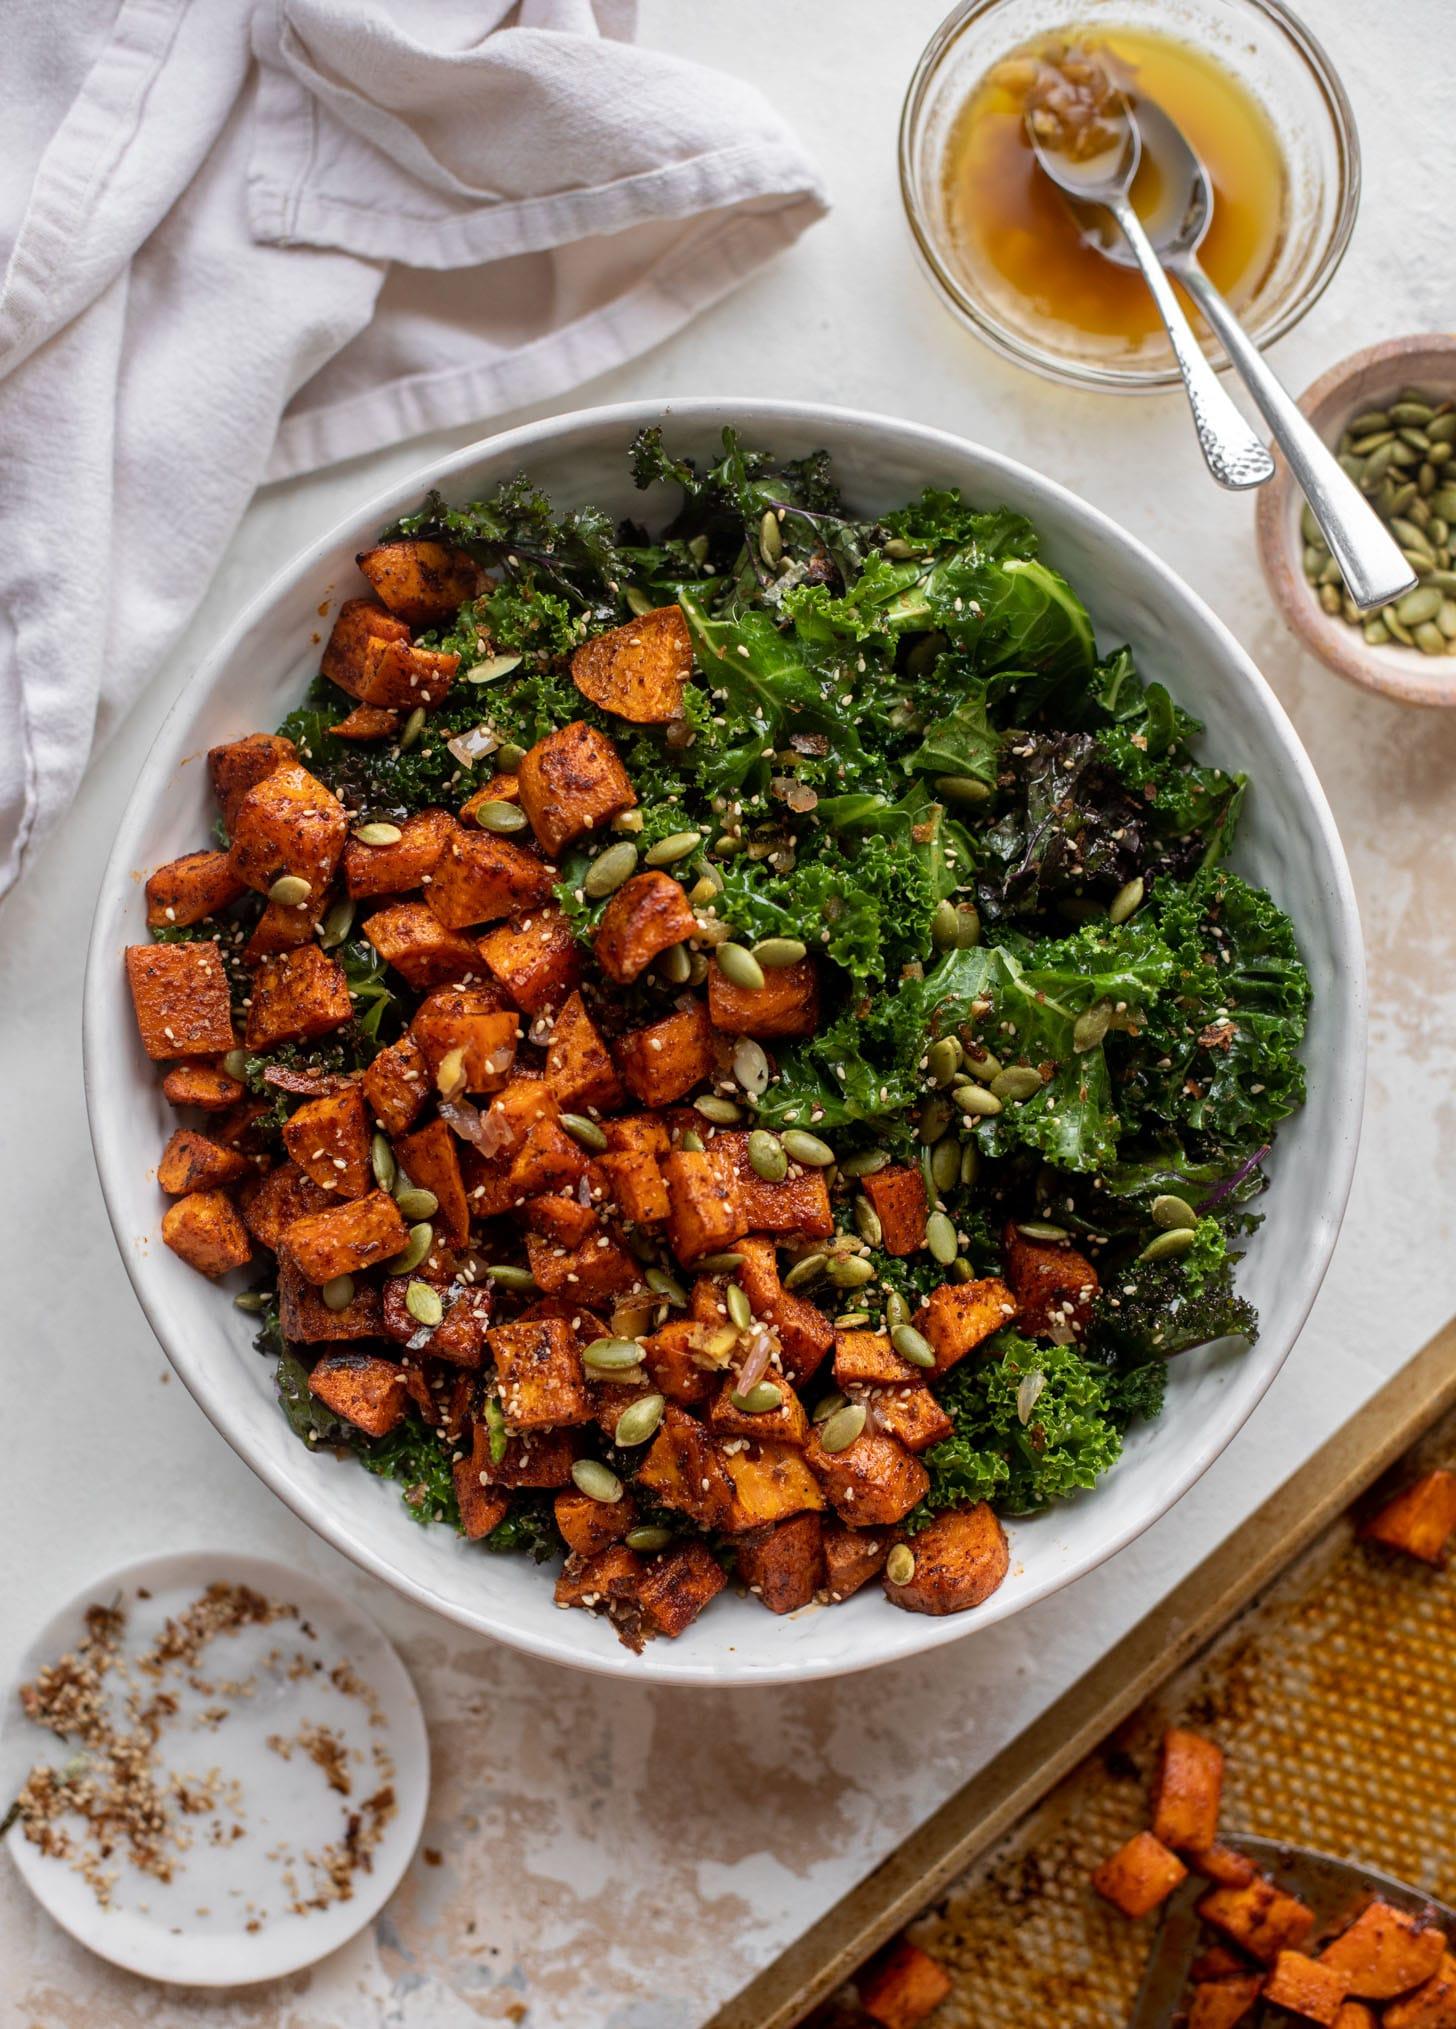 smoky sweet potato kale salad with hot ginger dressing